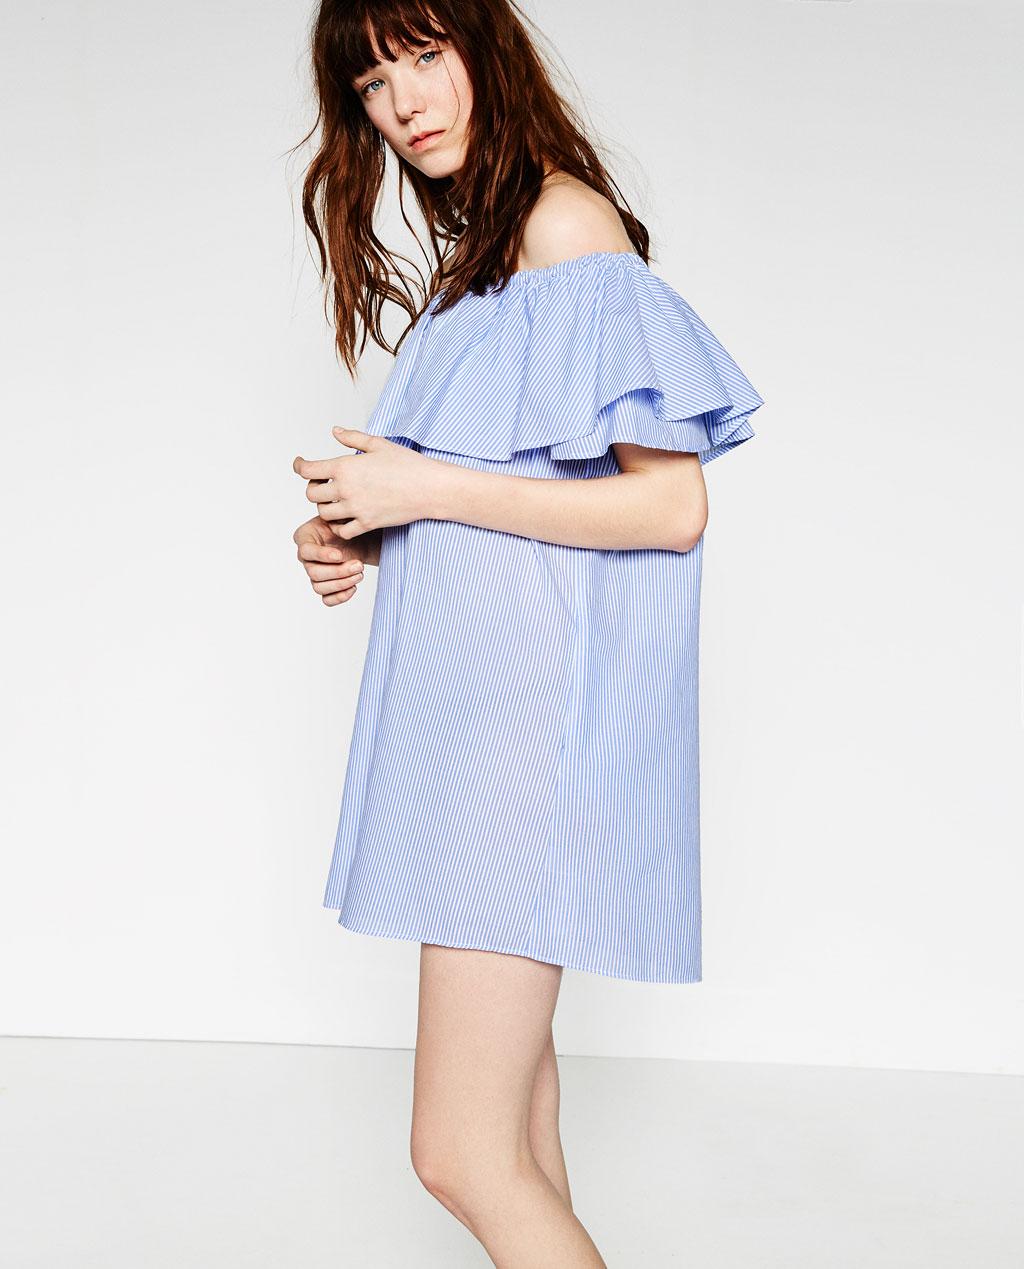 d06418a13c3b New Season  Ανανεωθείτε με ένα ανοιξιάτικο ριγέ φόρεμα